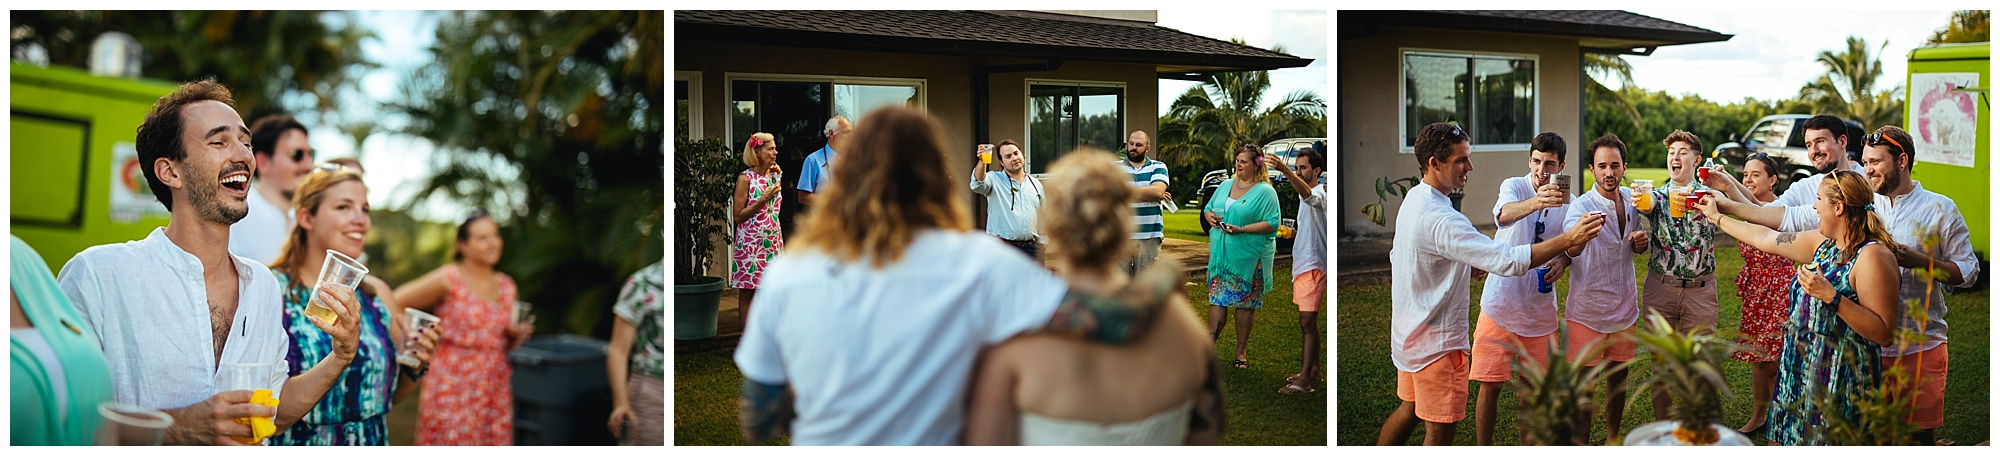 Kauai-Wedding_0016.jpg